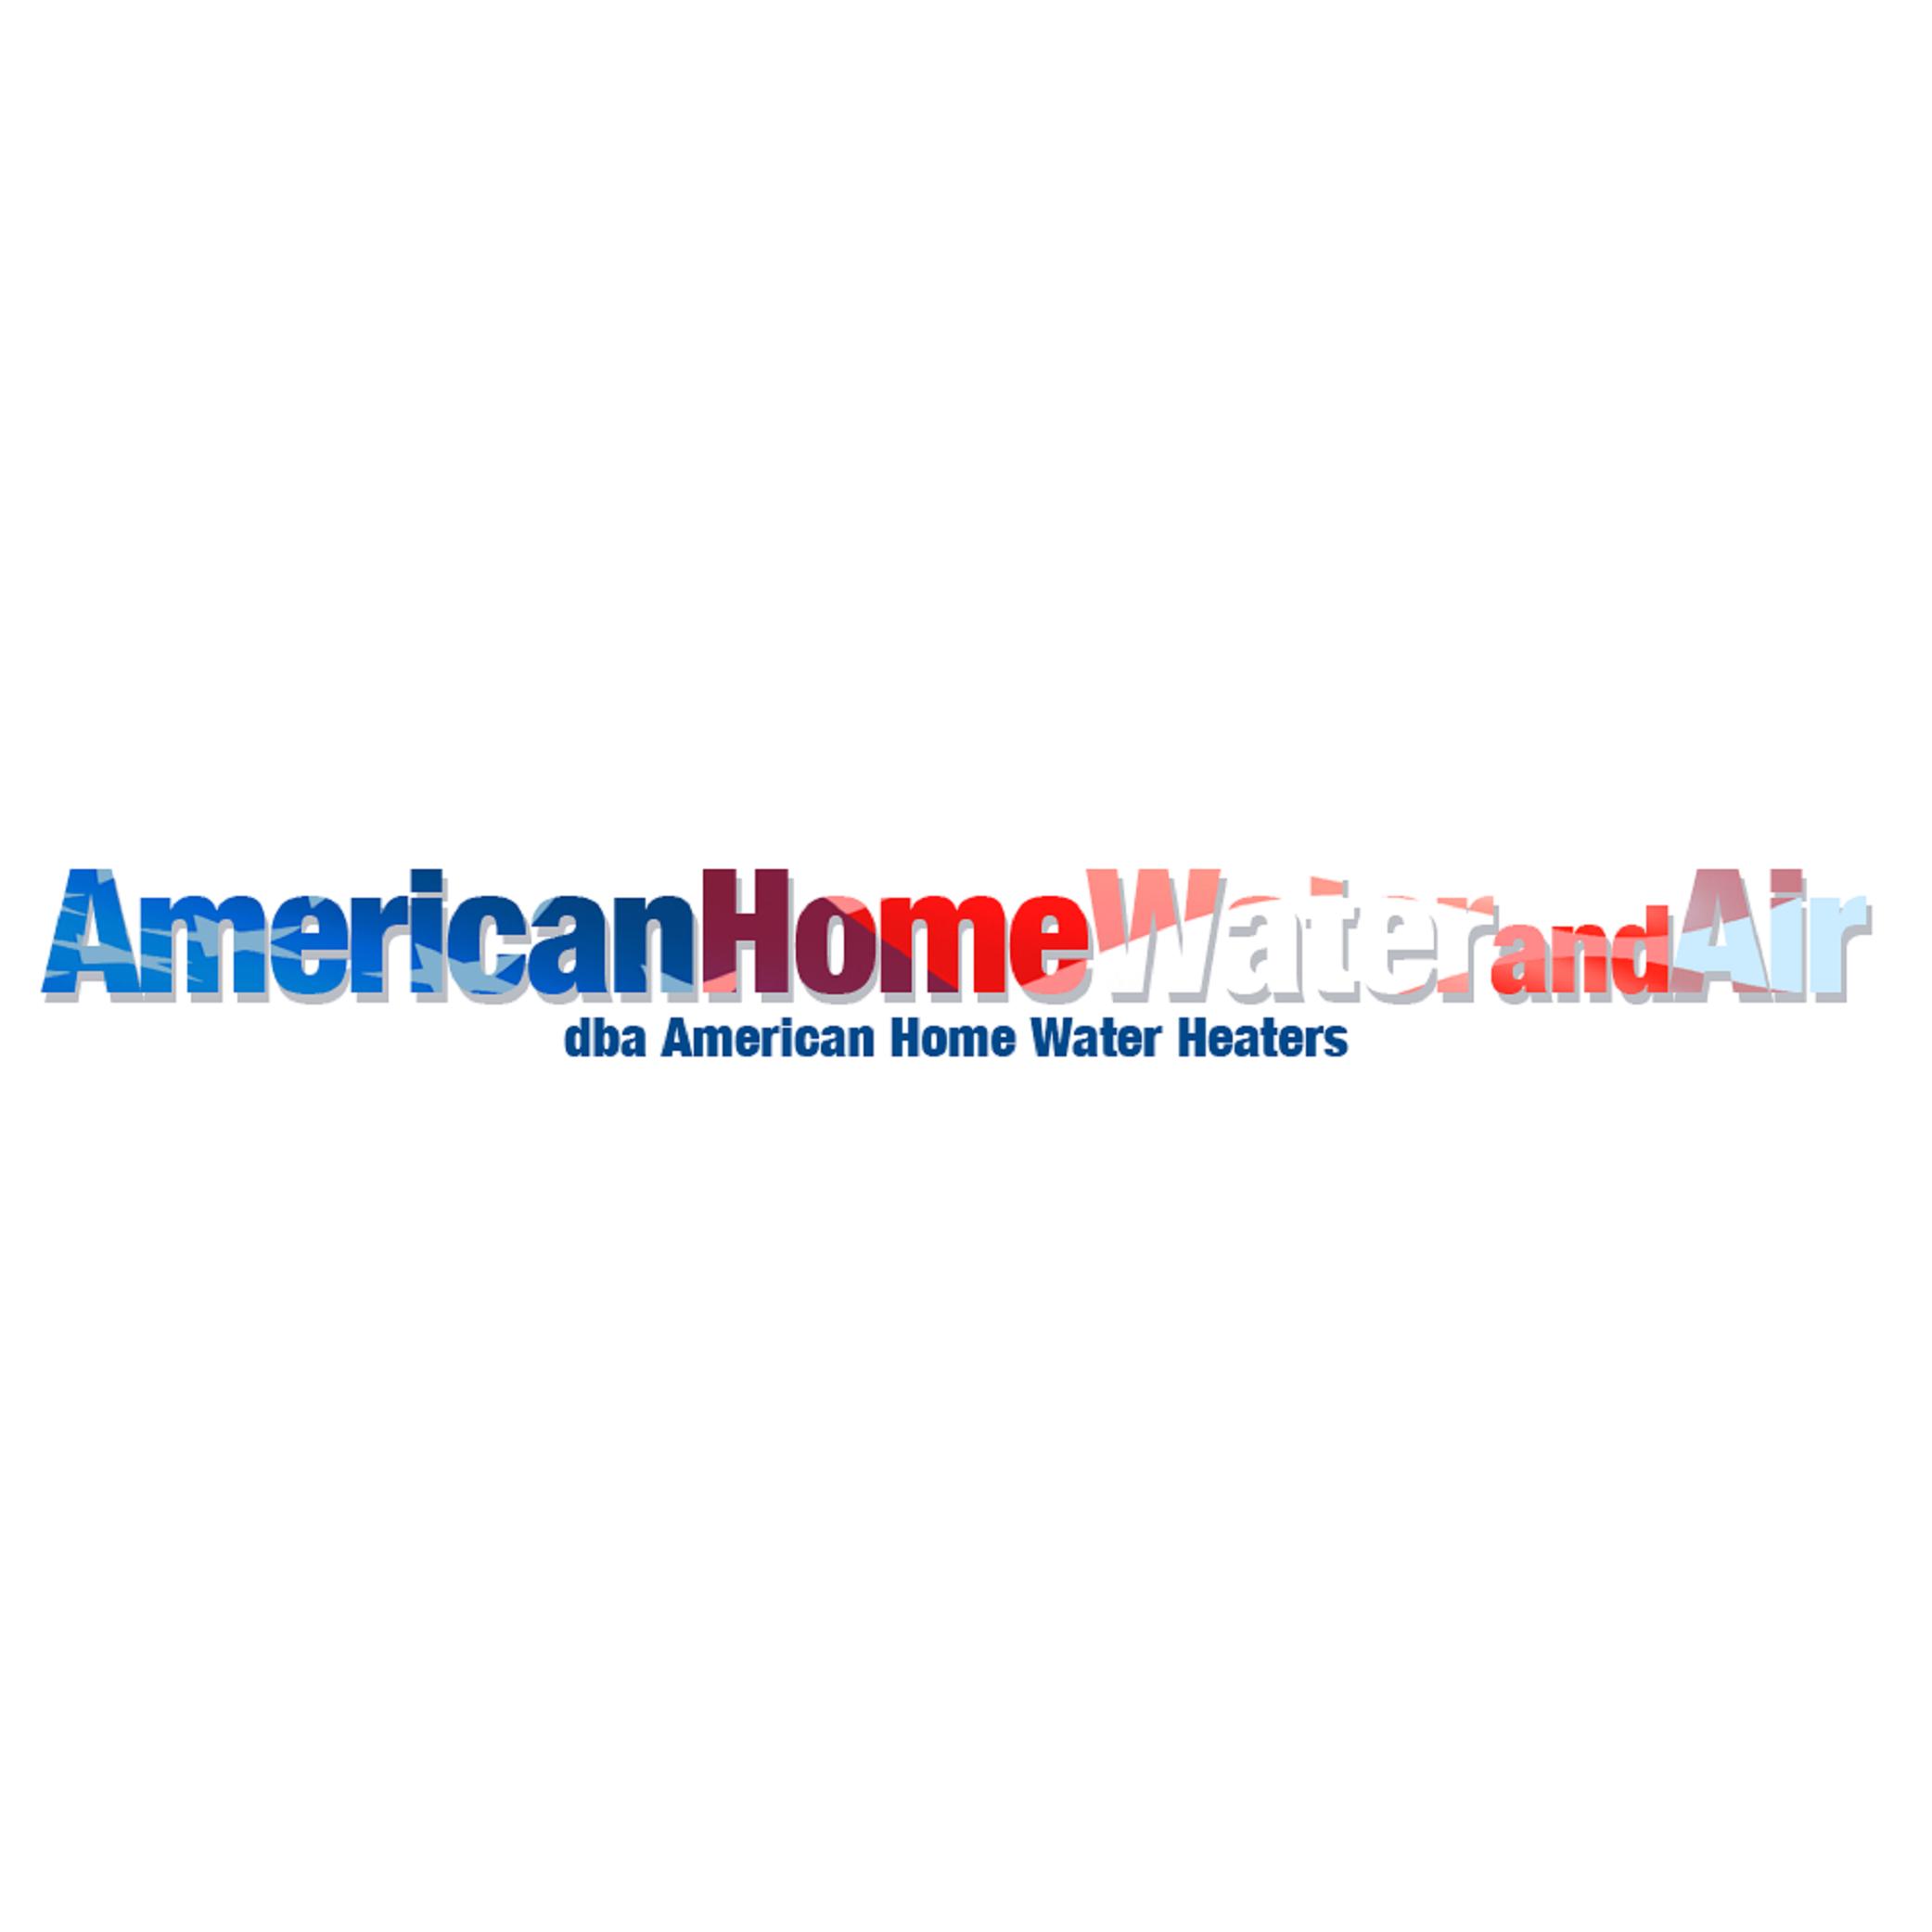 American Home Water & Air